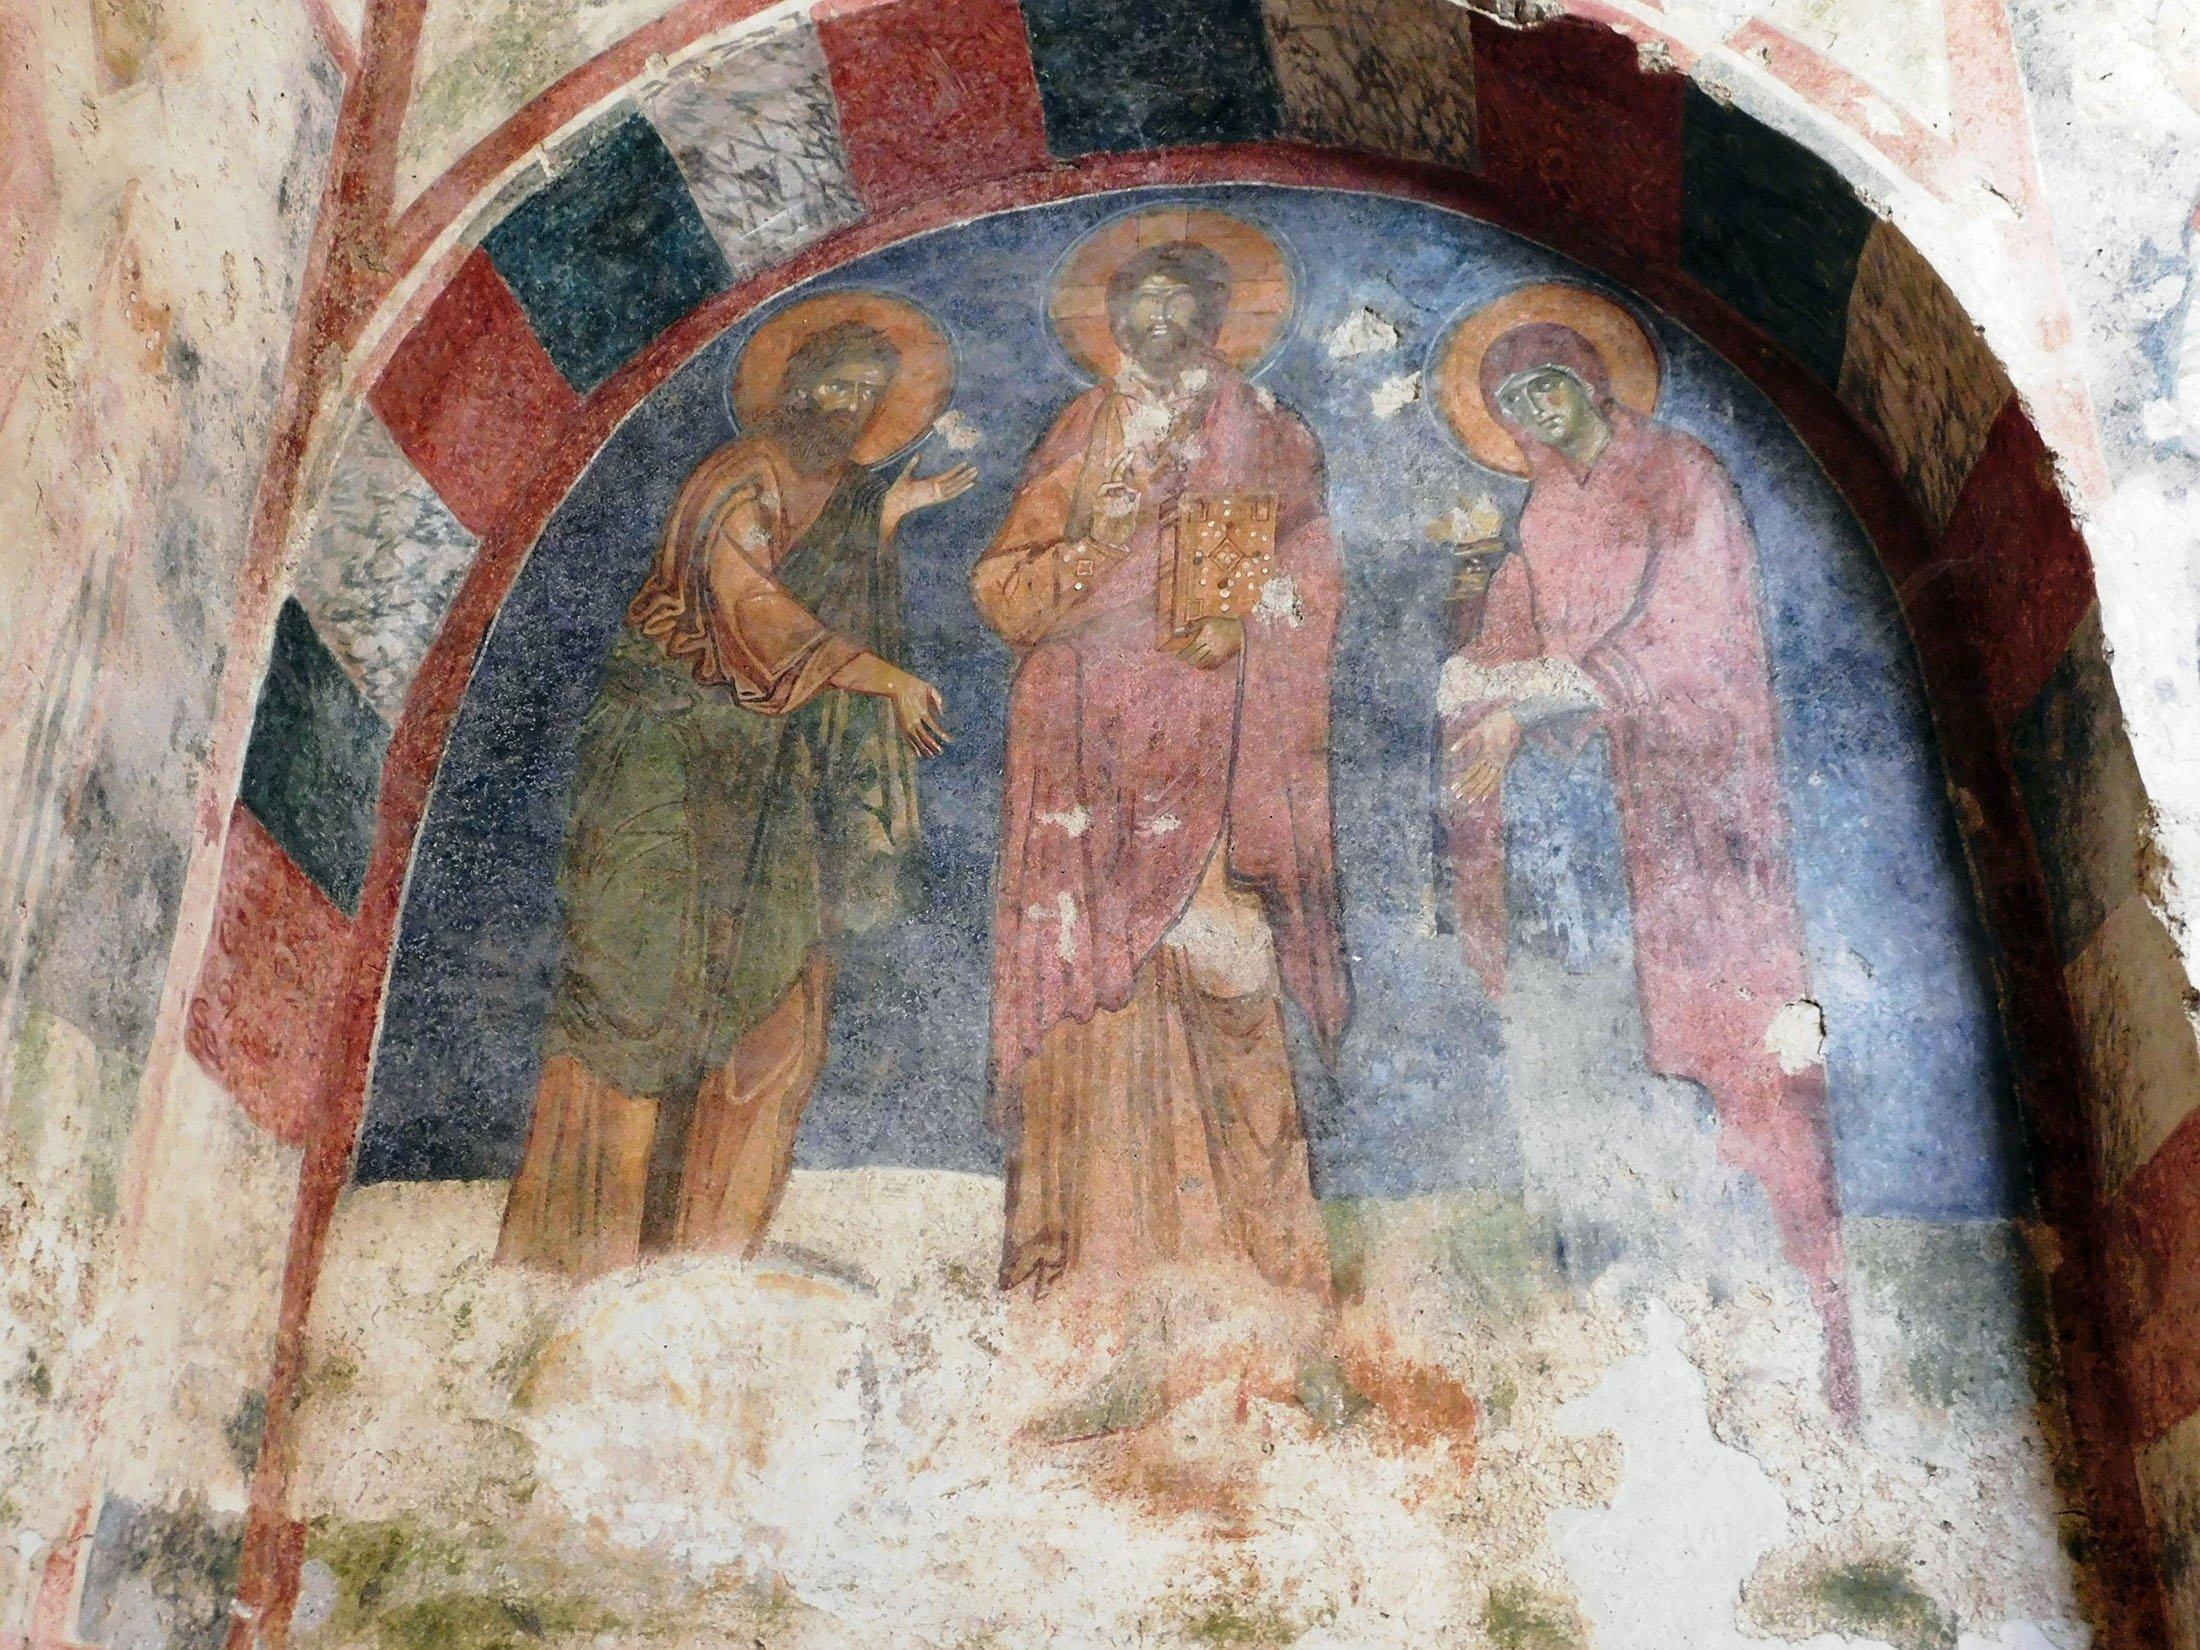 Frescos in the Saint Nicholas church in Demre, Antalya, southern Turkey. (Shutterstock Photo)